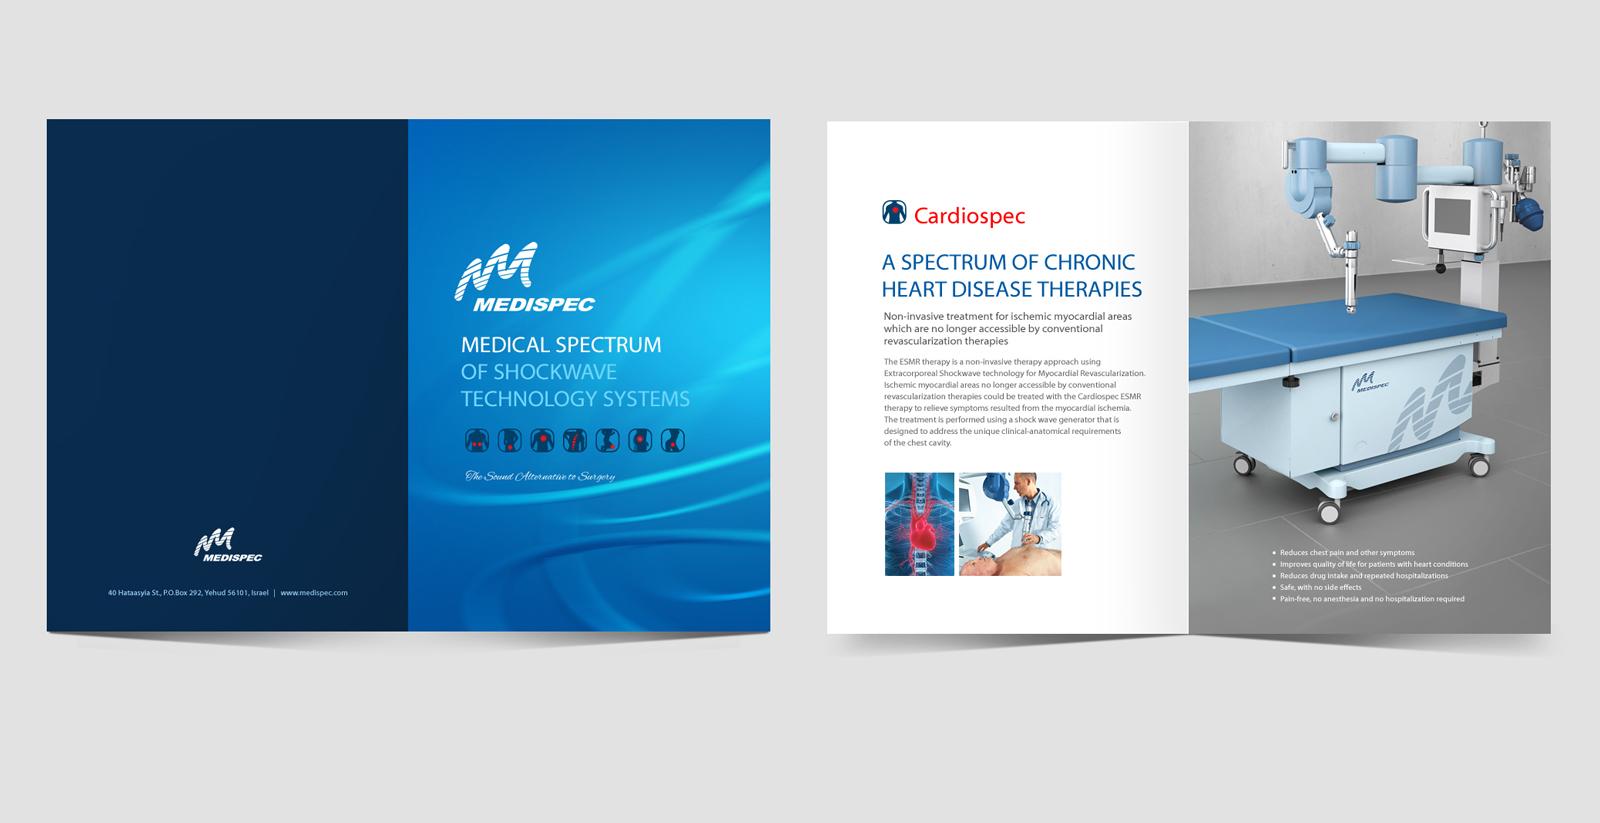 - MEDISPEC - צילומי קמפיין לחברת ציוד רפואי – צילום קטלוג וצילום לאתר הבית של החברה